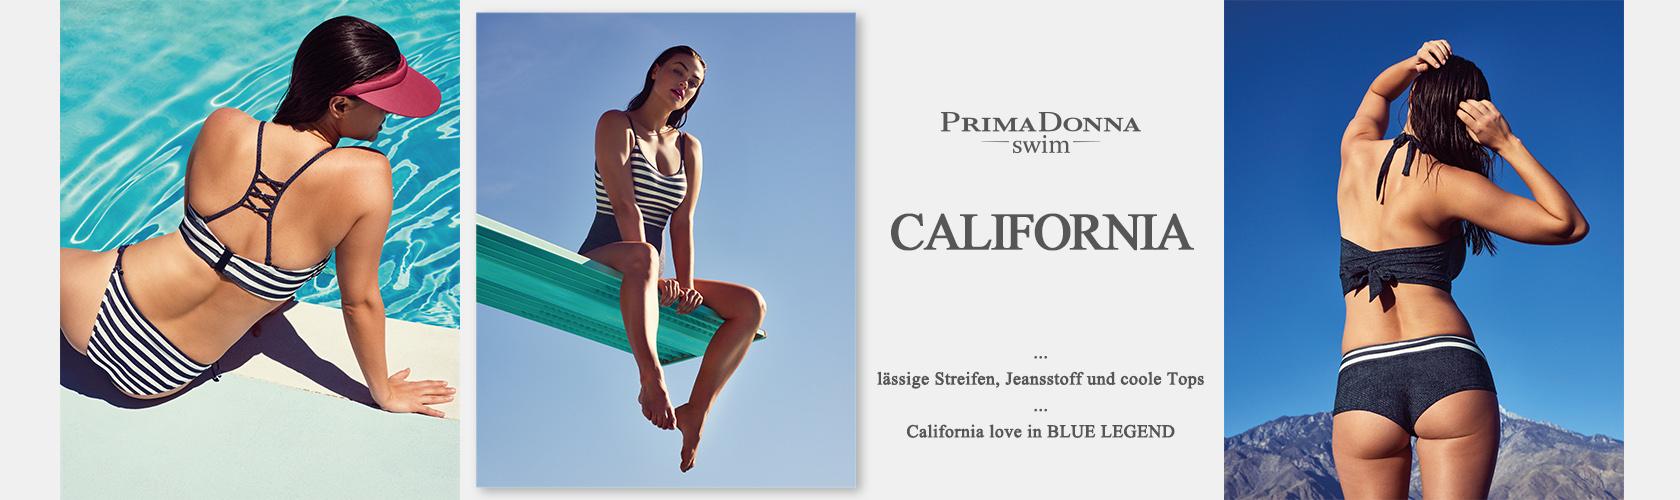 Slideshow CALIFORNIA BLL 07.06.